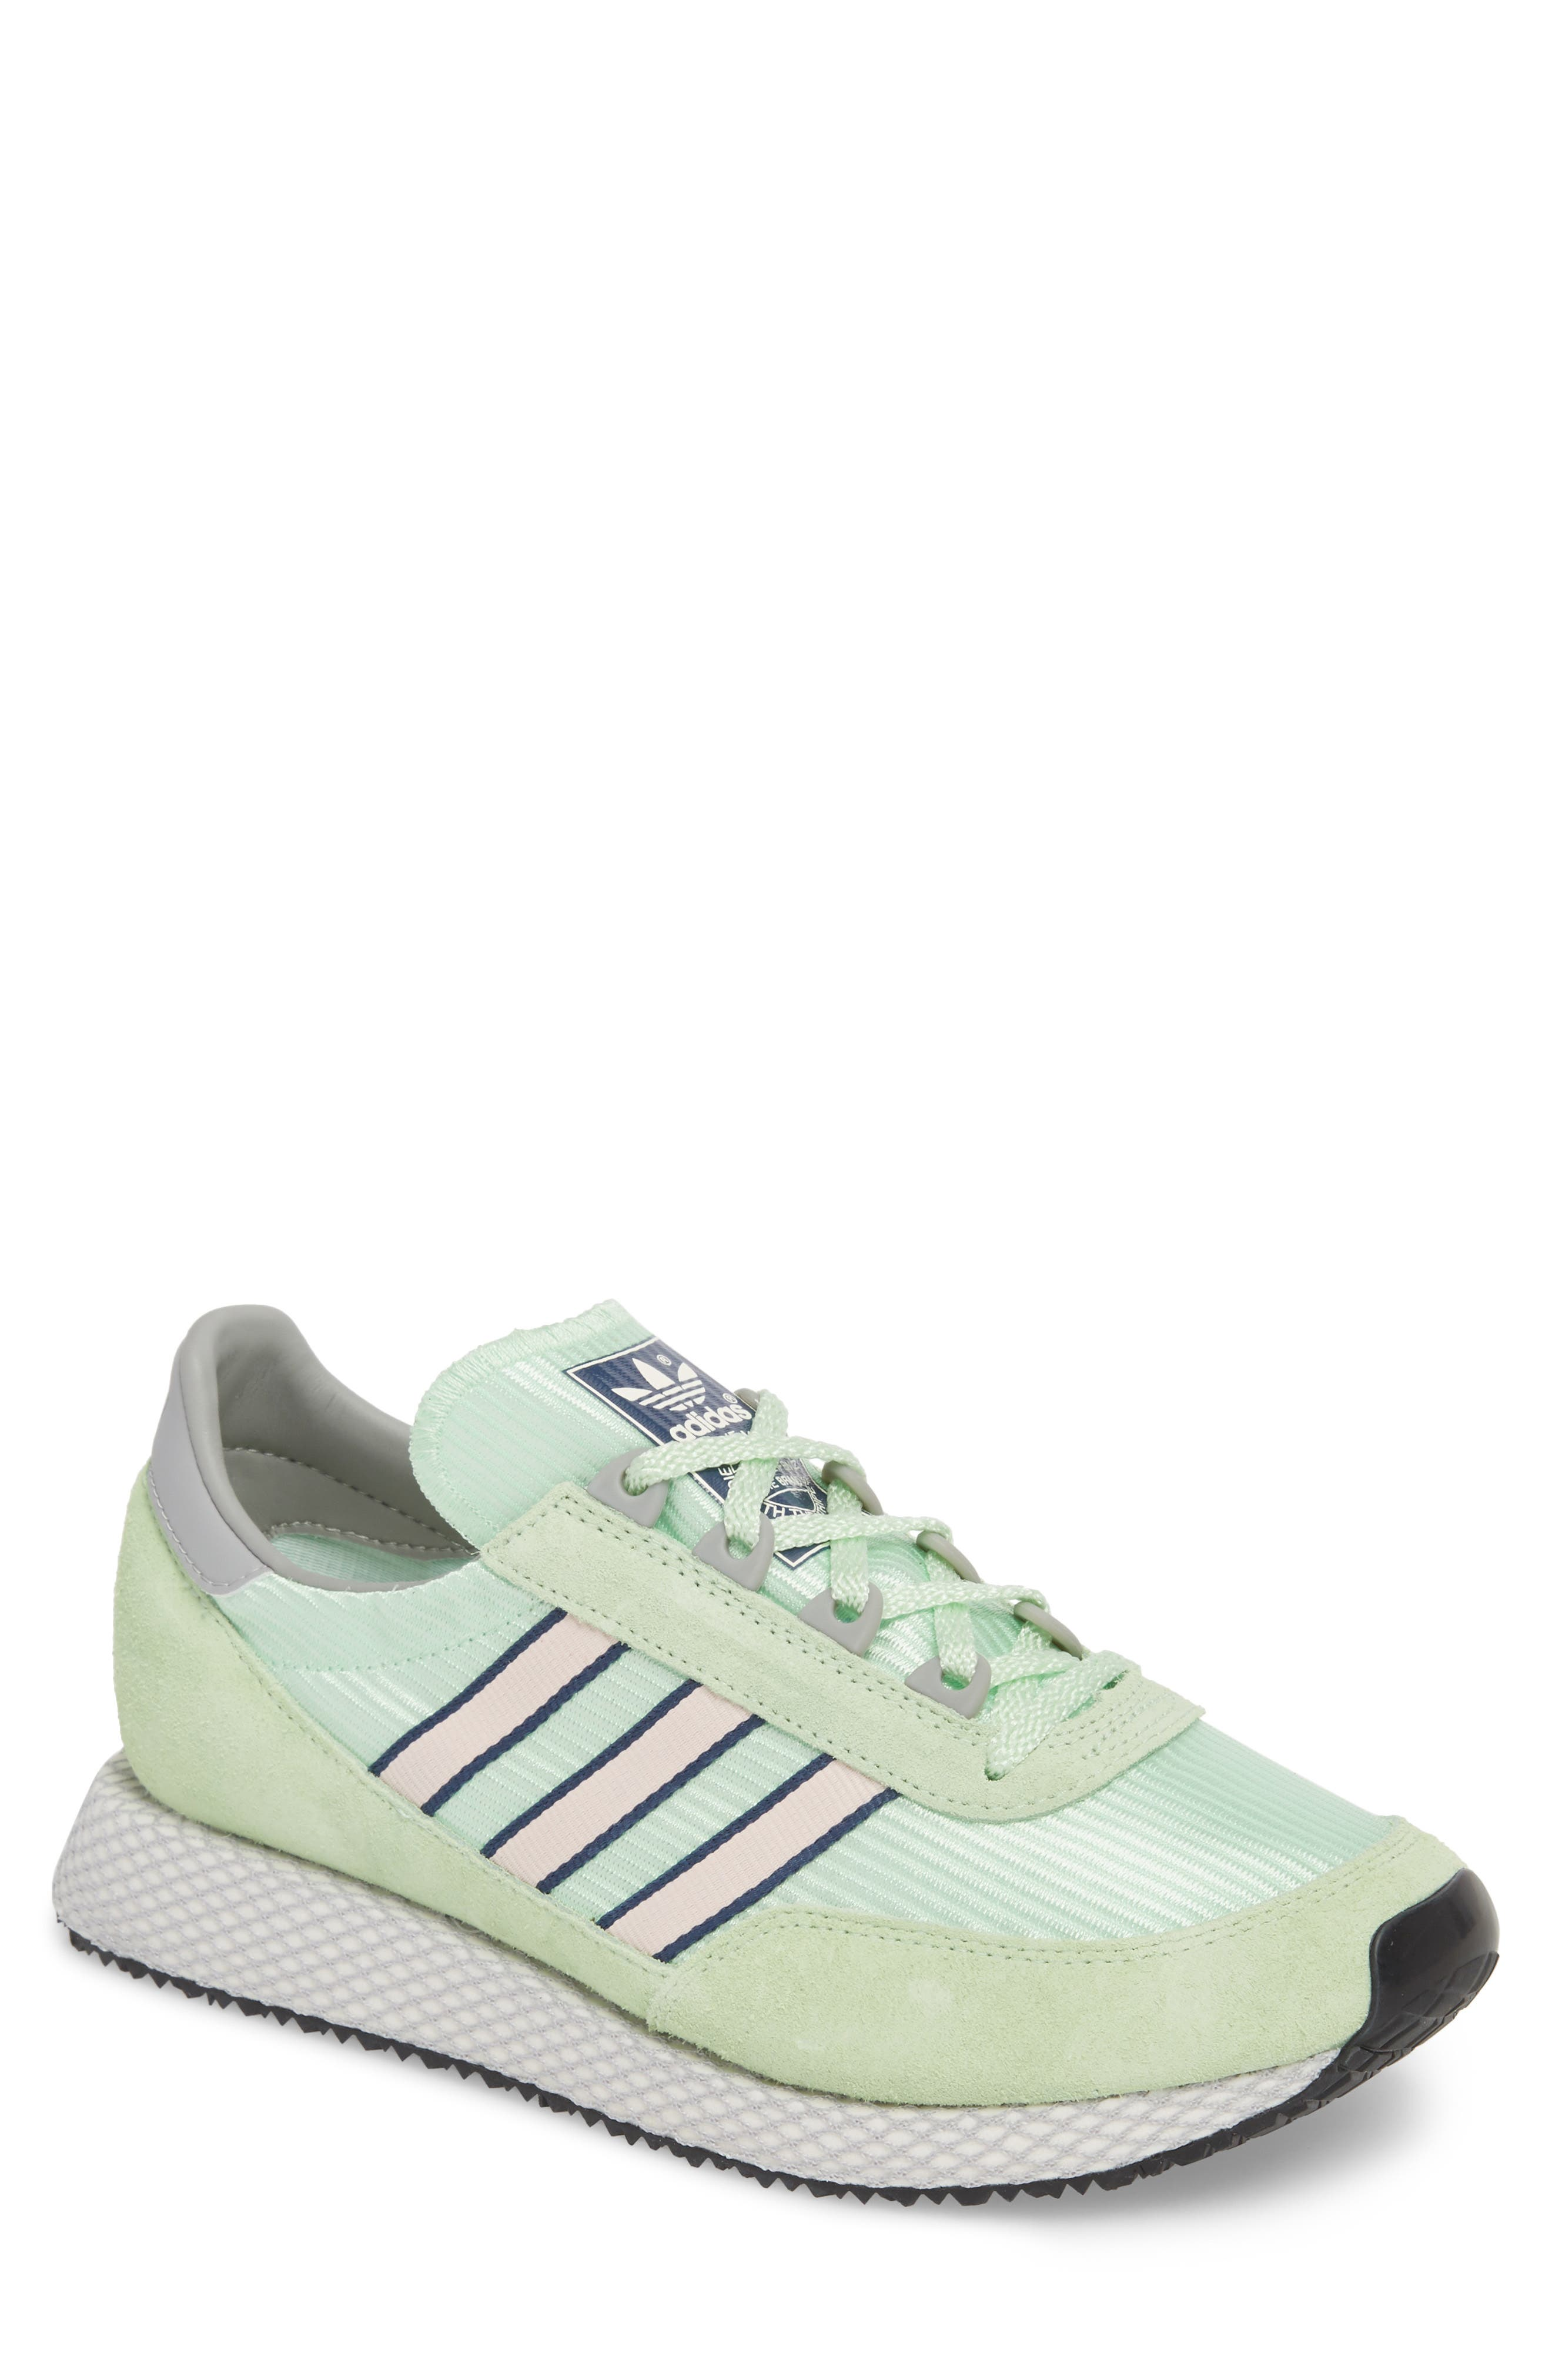 Glenbuck SPZL Sneaker,                             Main thumbnail 1, color,                             Green